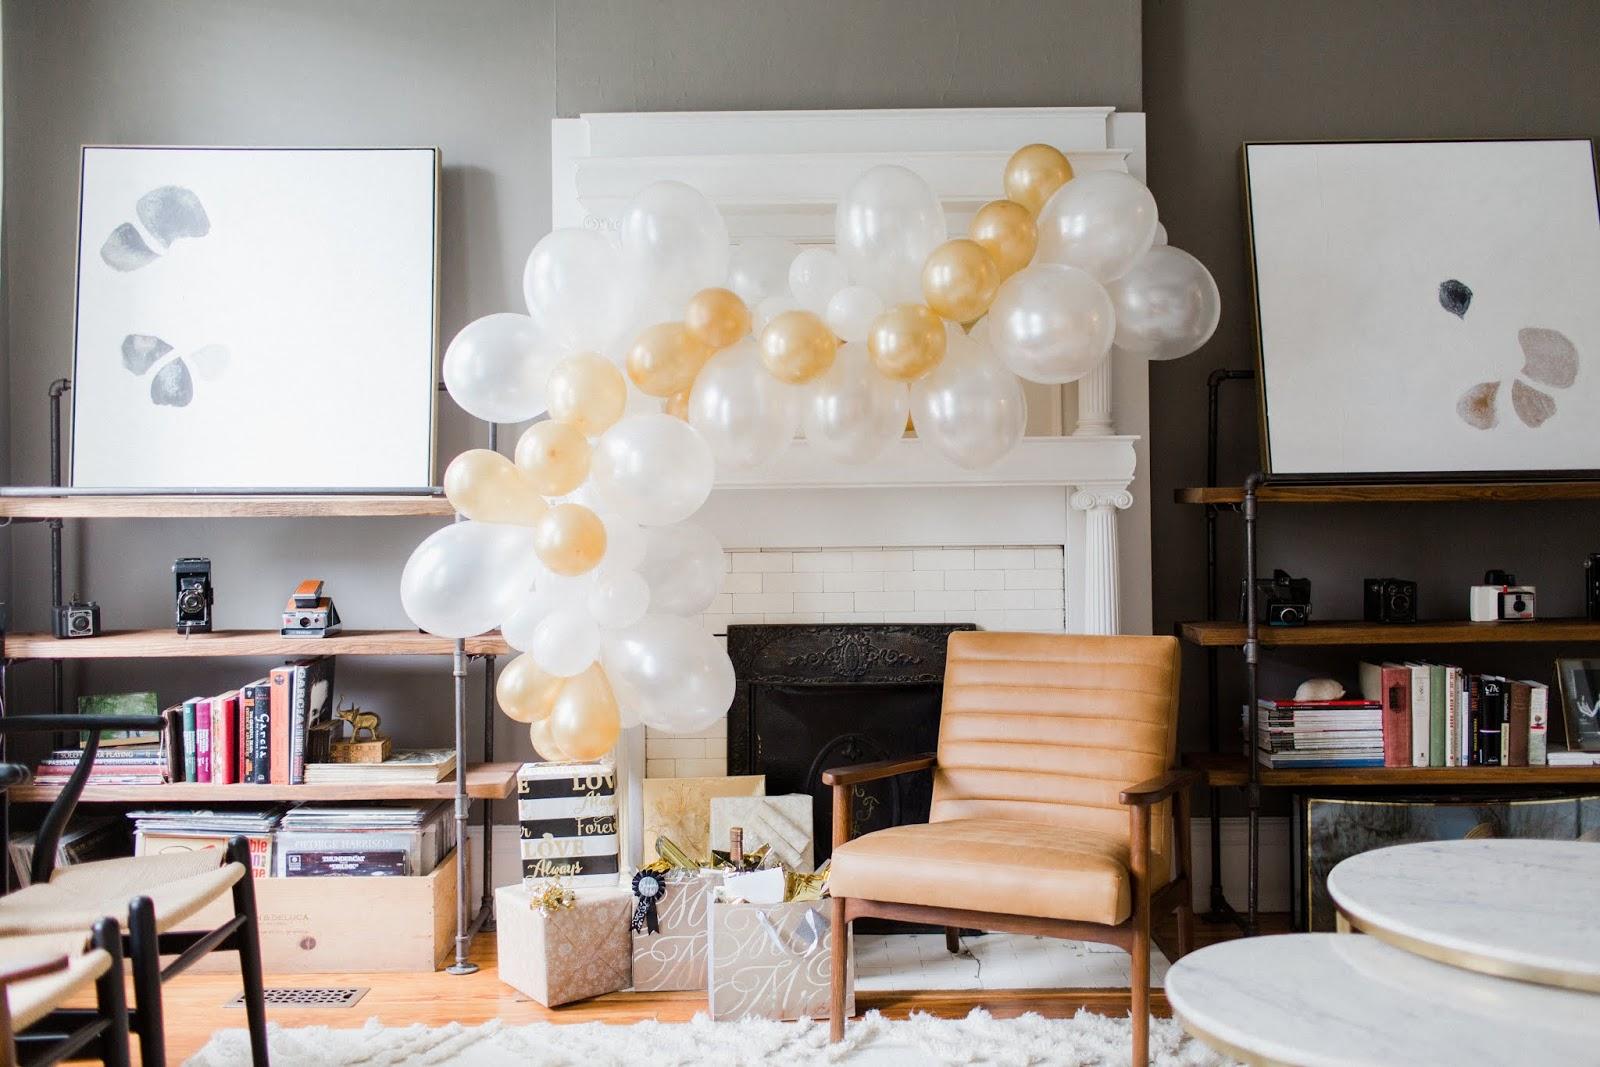 how to diy balloon garland bridal shower backdrop